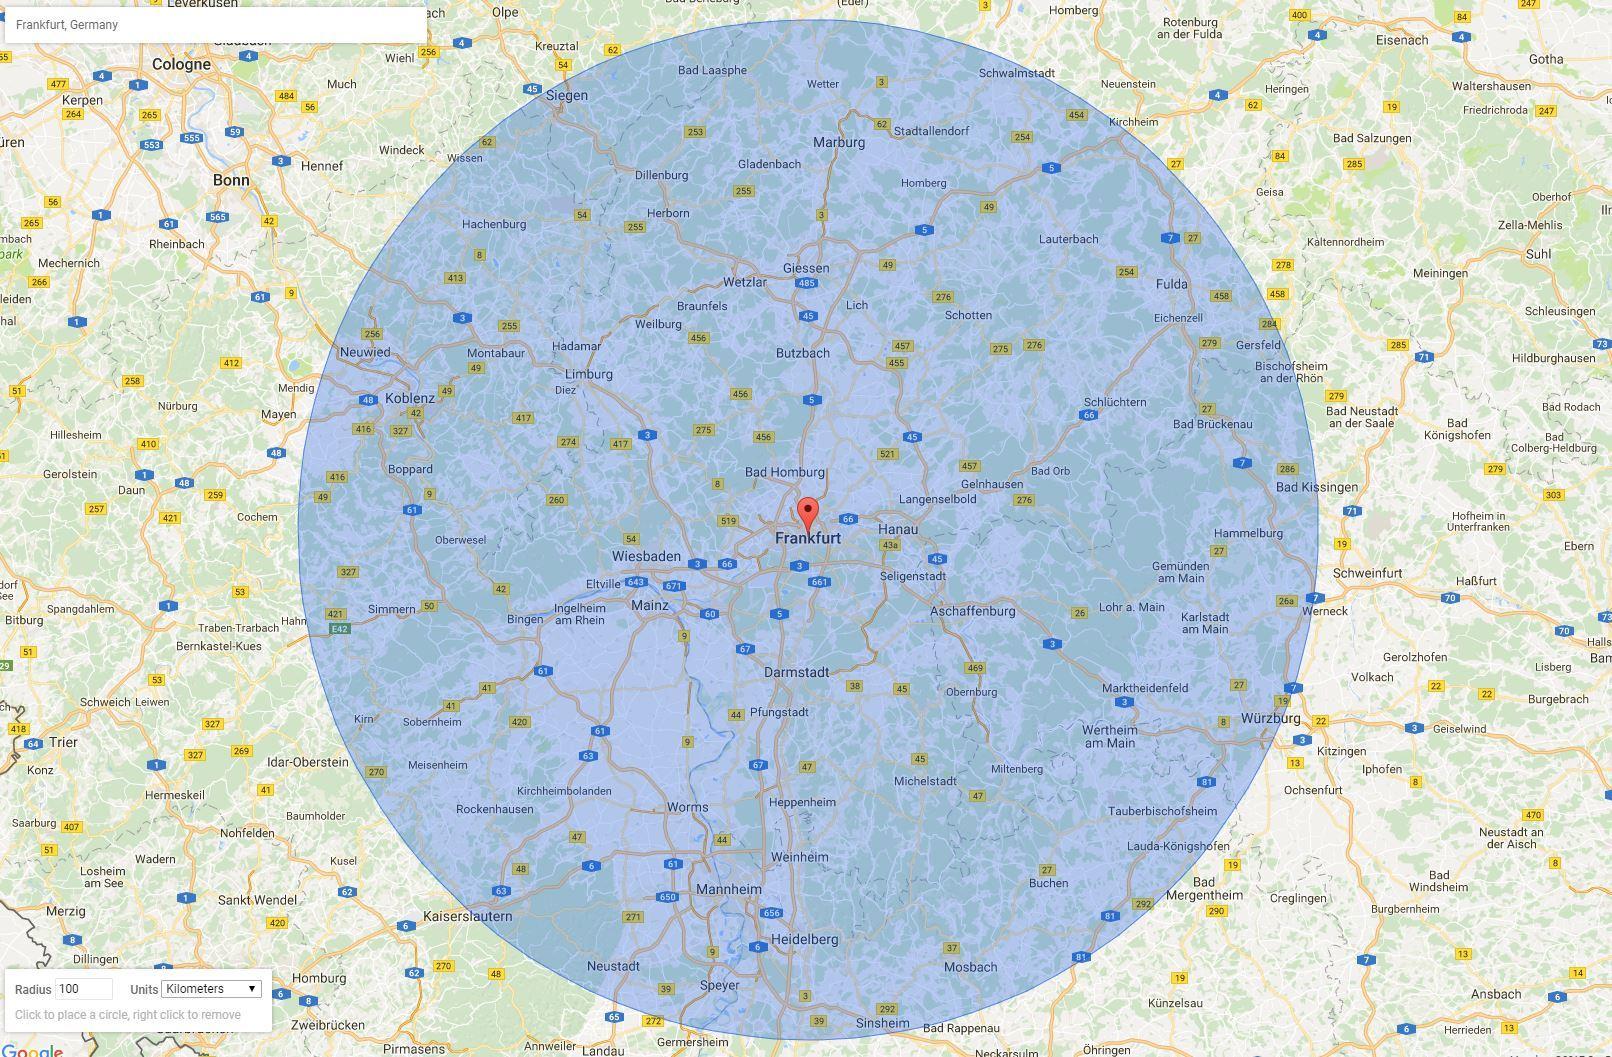 Map with a radius of 100 Km around Frankfurt, Germany